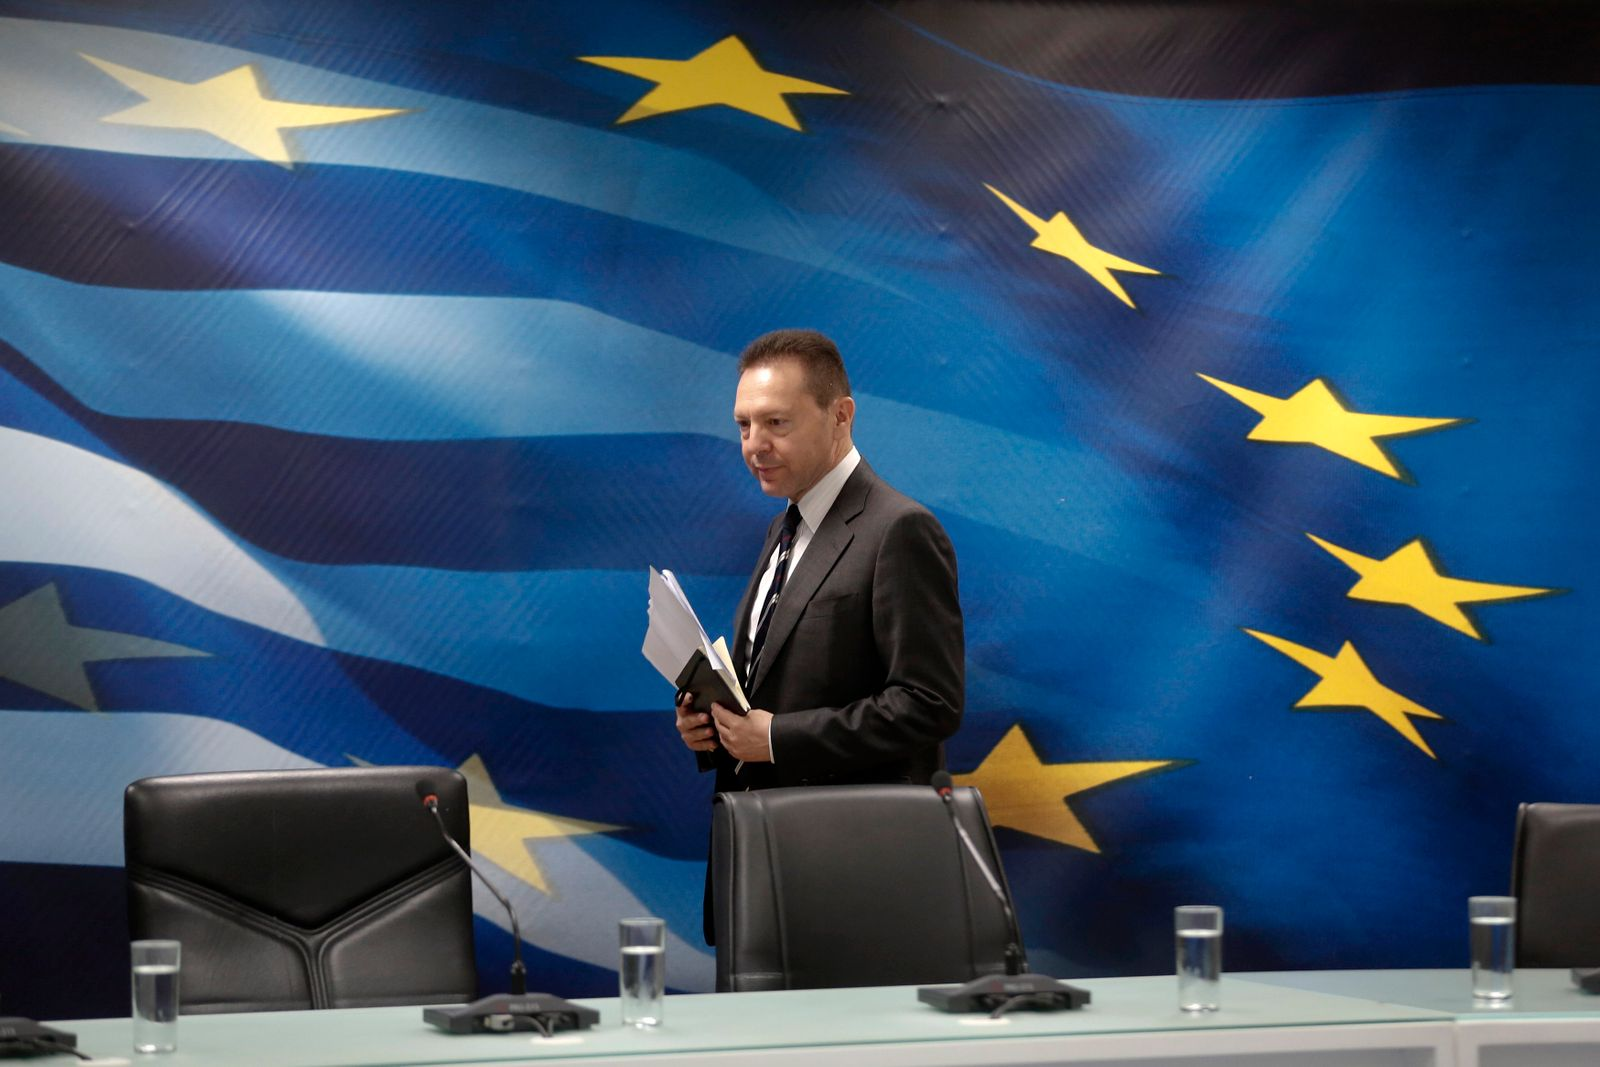 Stournaras / EU-Flagge / Griechenland Flagge